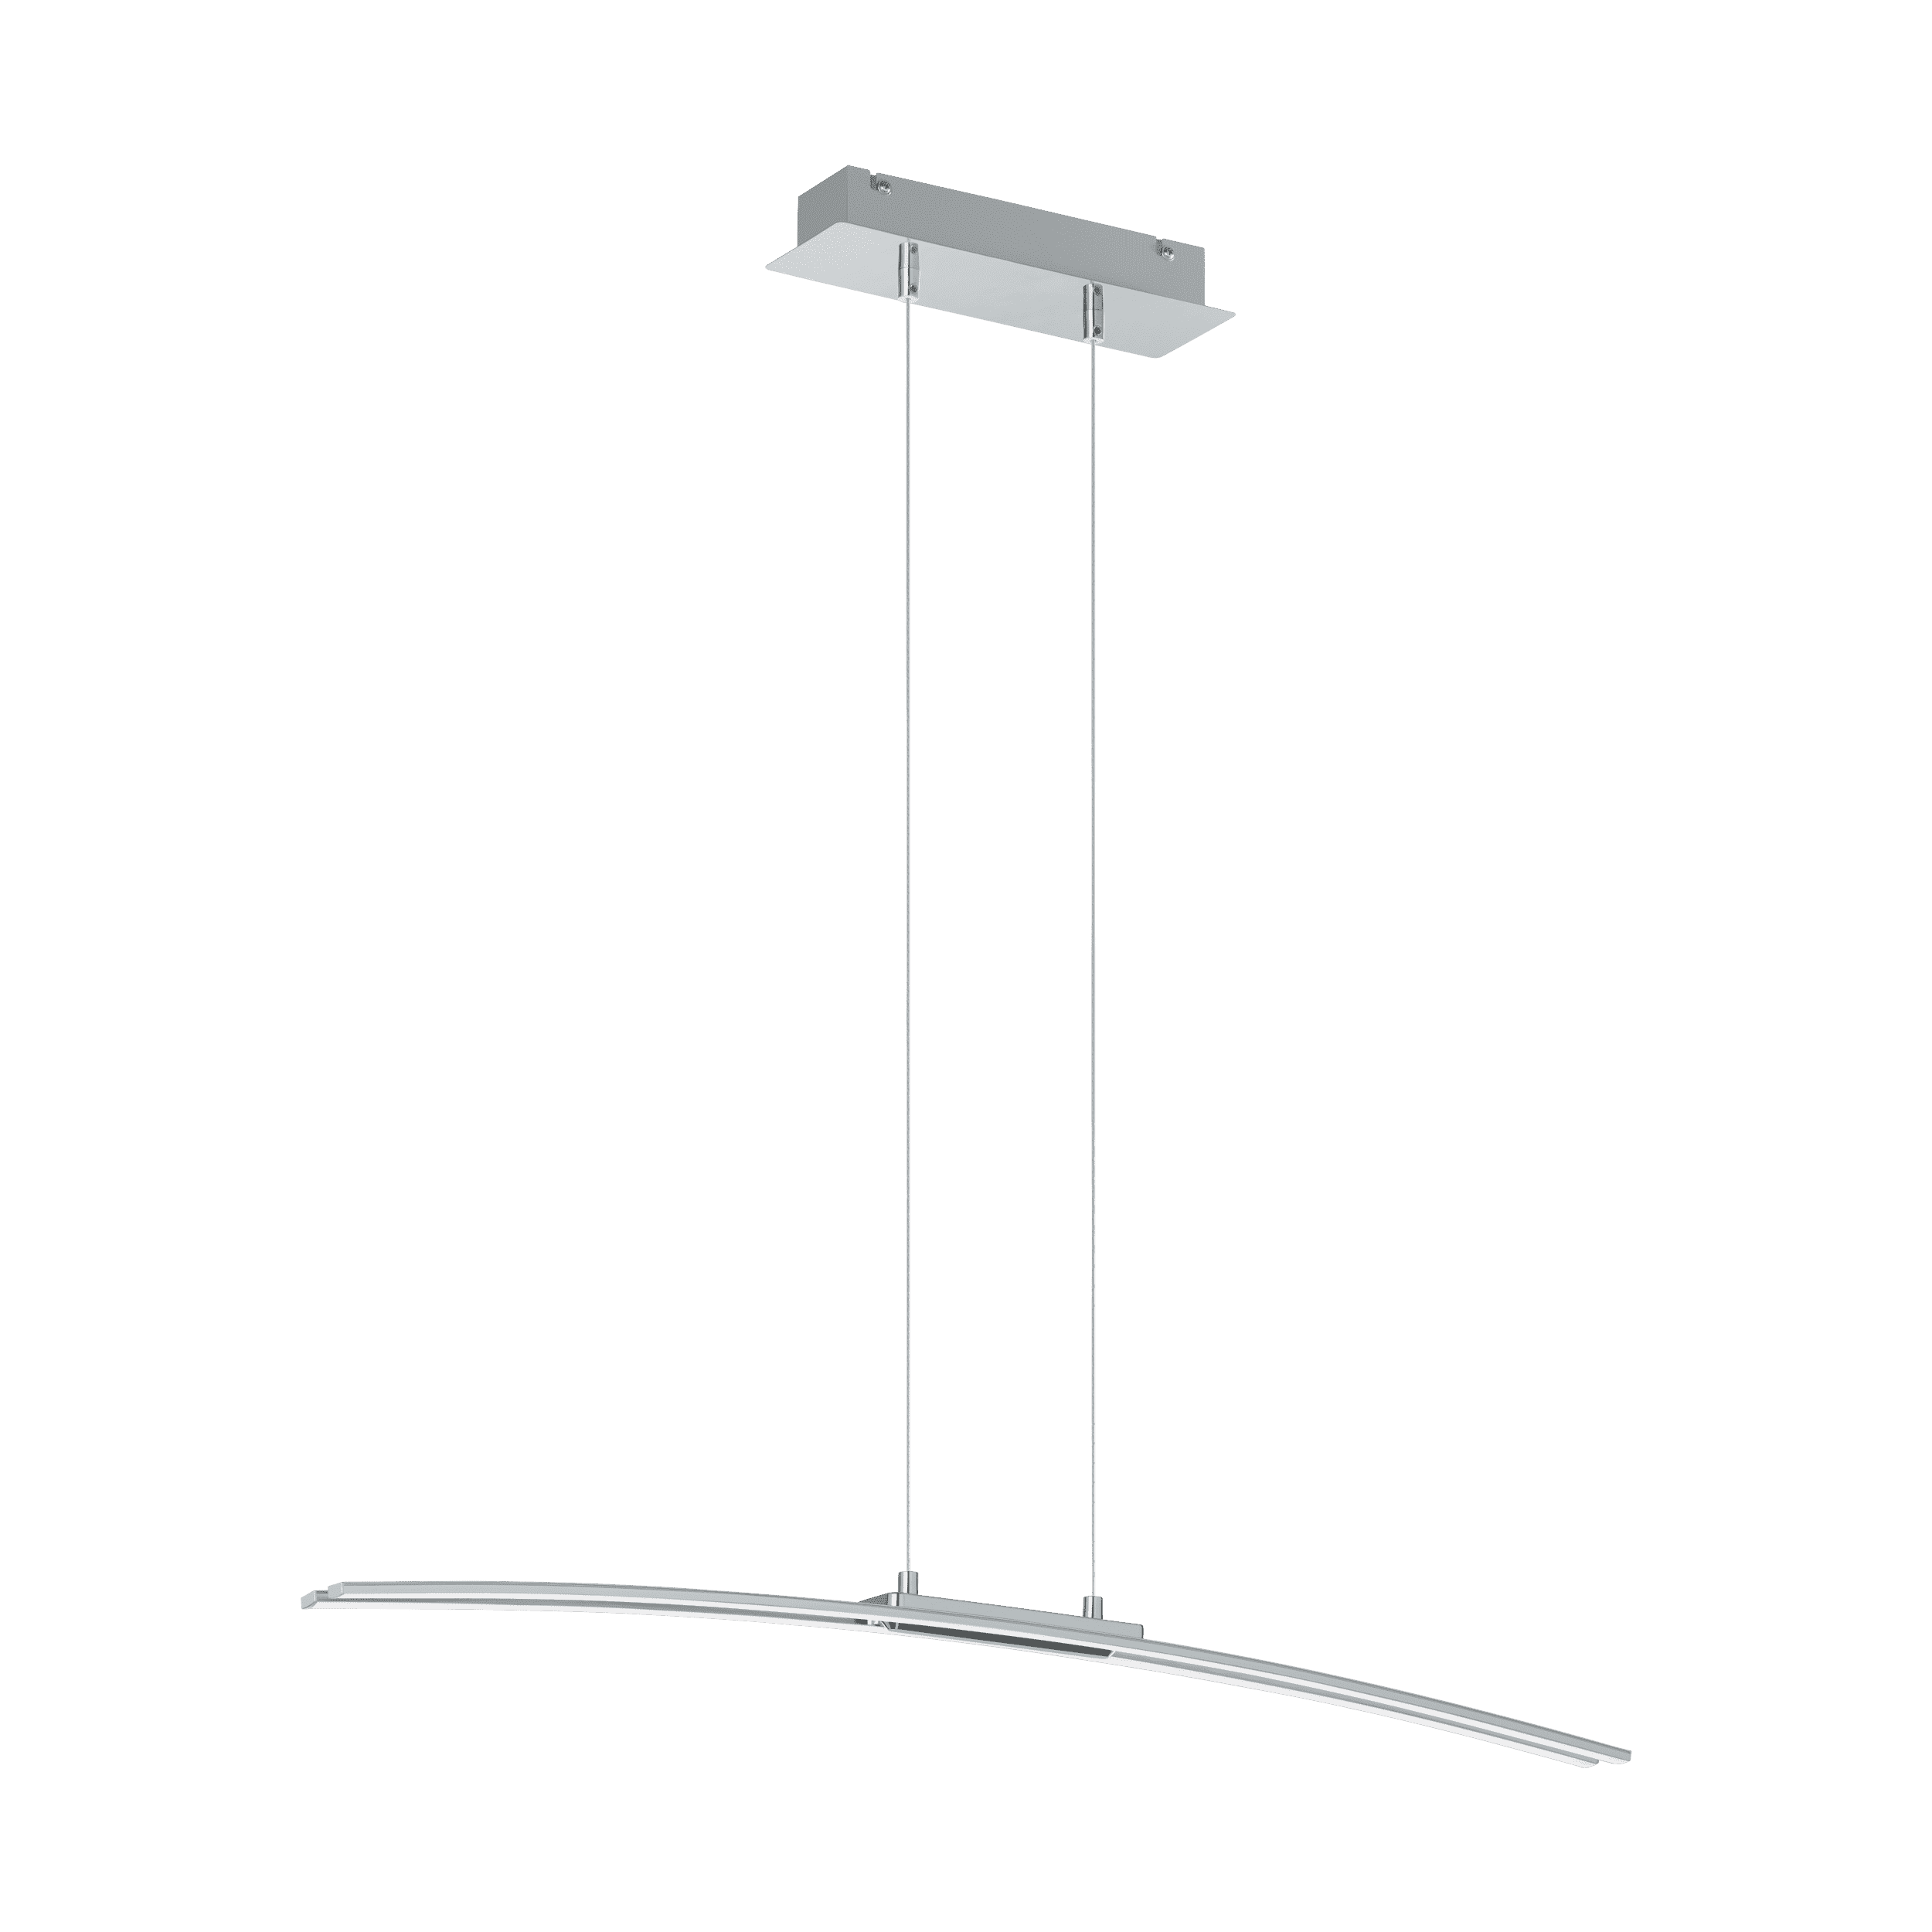 LED-ΚΡΕΜΑΣΤΟ ΦΩΤΙΣΤΙΚΟ ΧΡΩΜΕ / ΛΕΥΚΟ LASANA - 95147 - EGLO